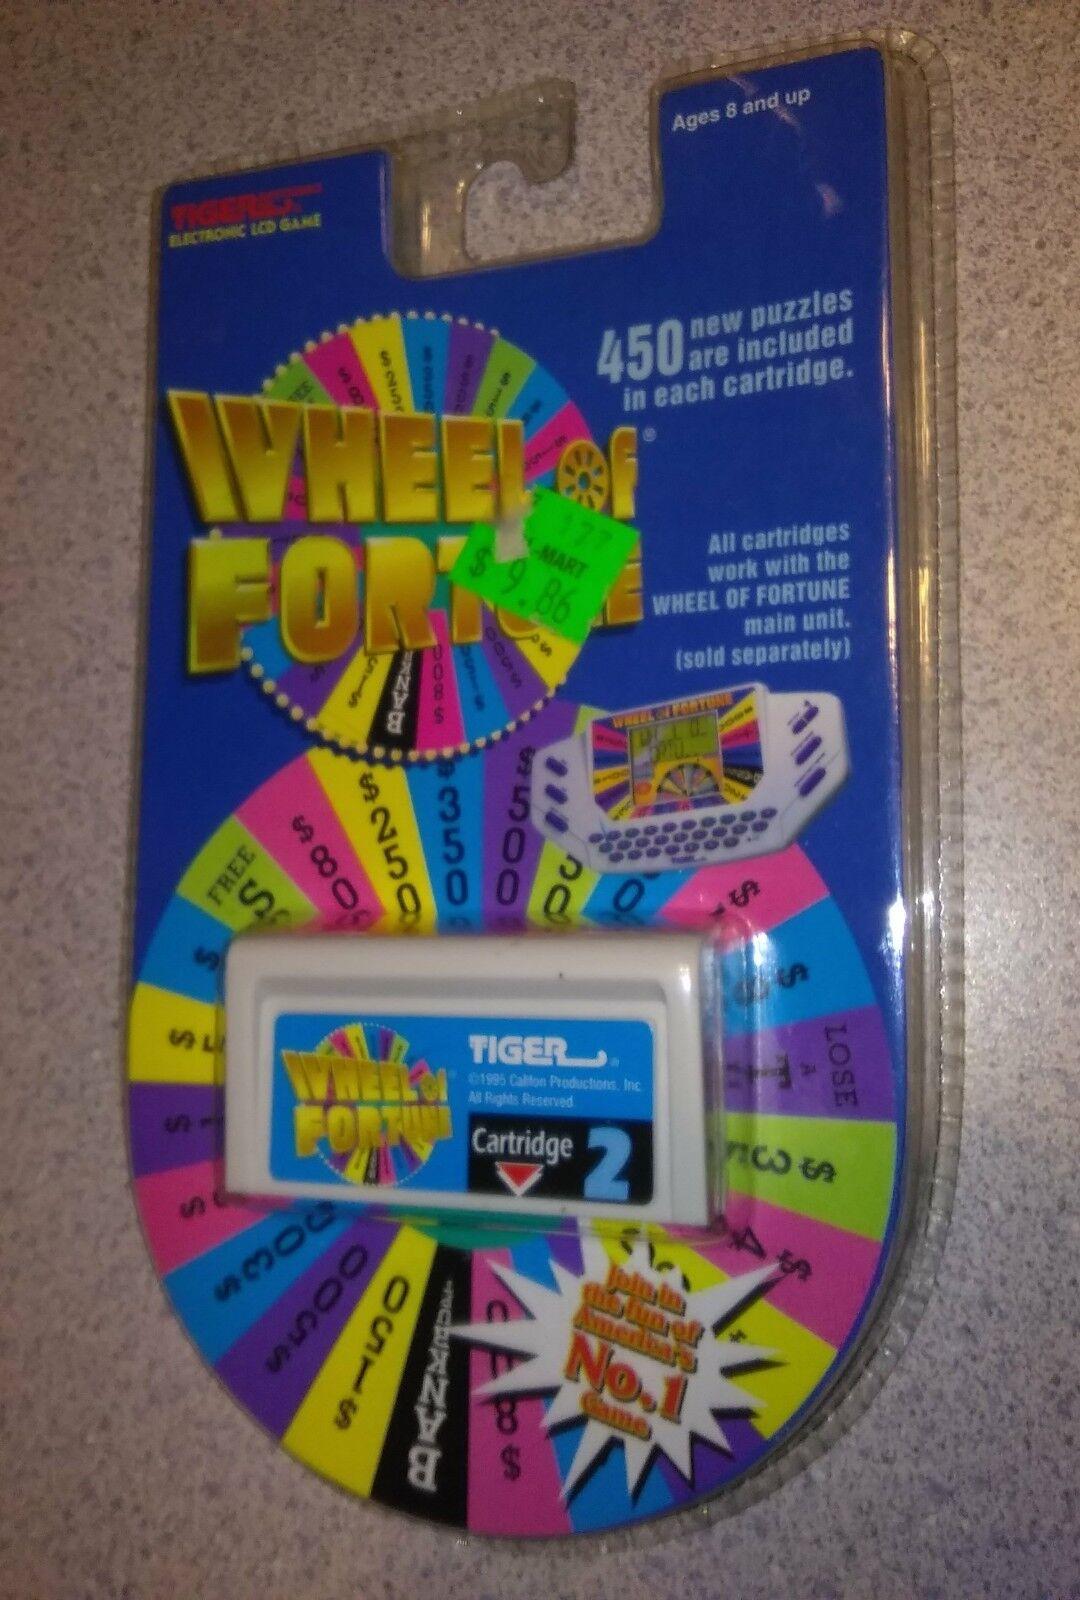 Tiger Wheel of Fortune Cartridge